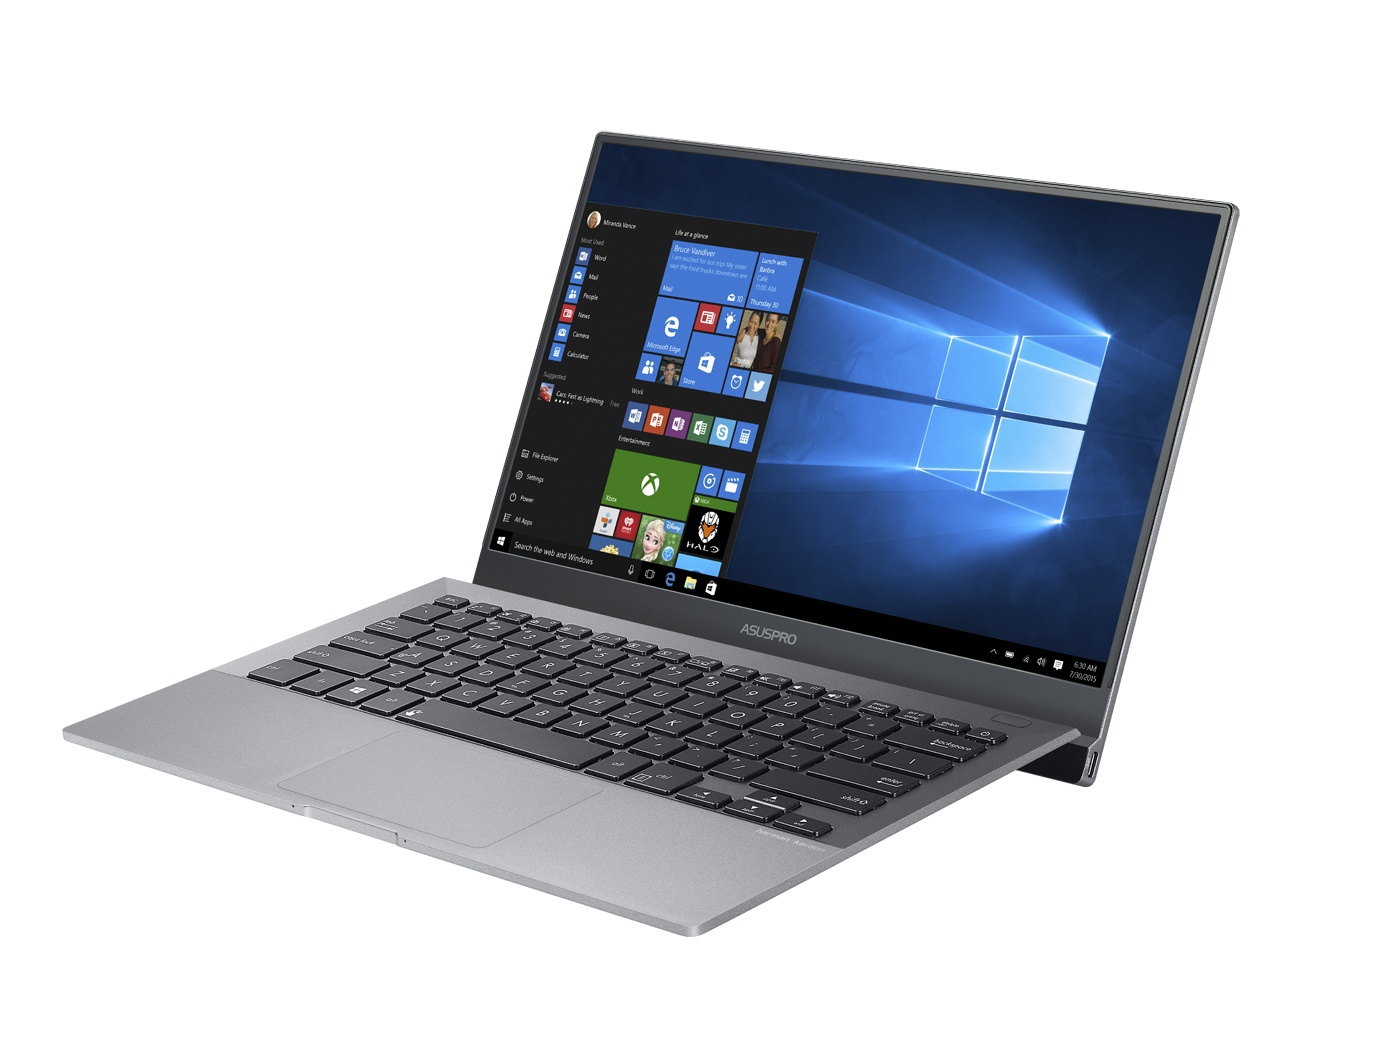 Secretele construcției noilor laptopuri Zenbook